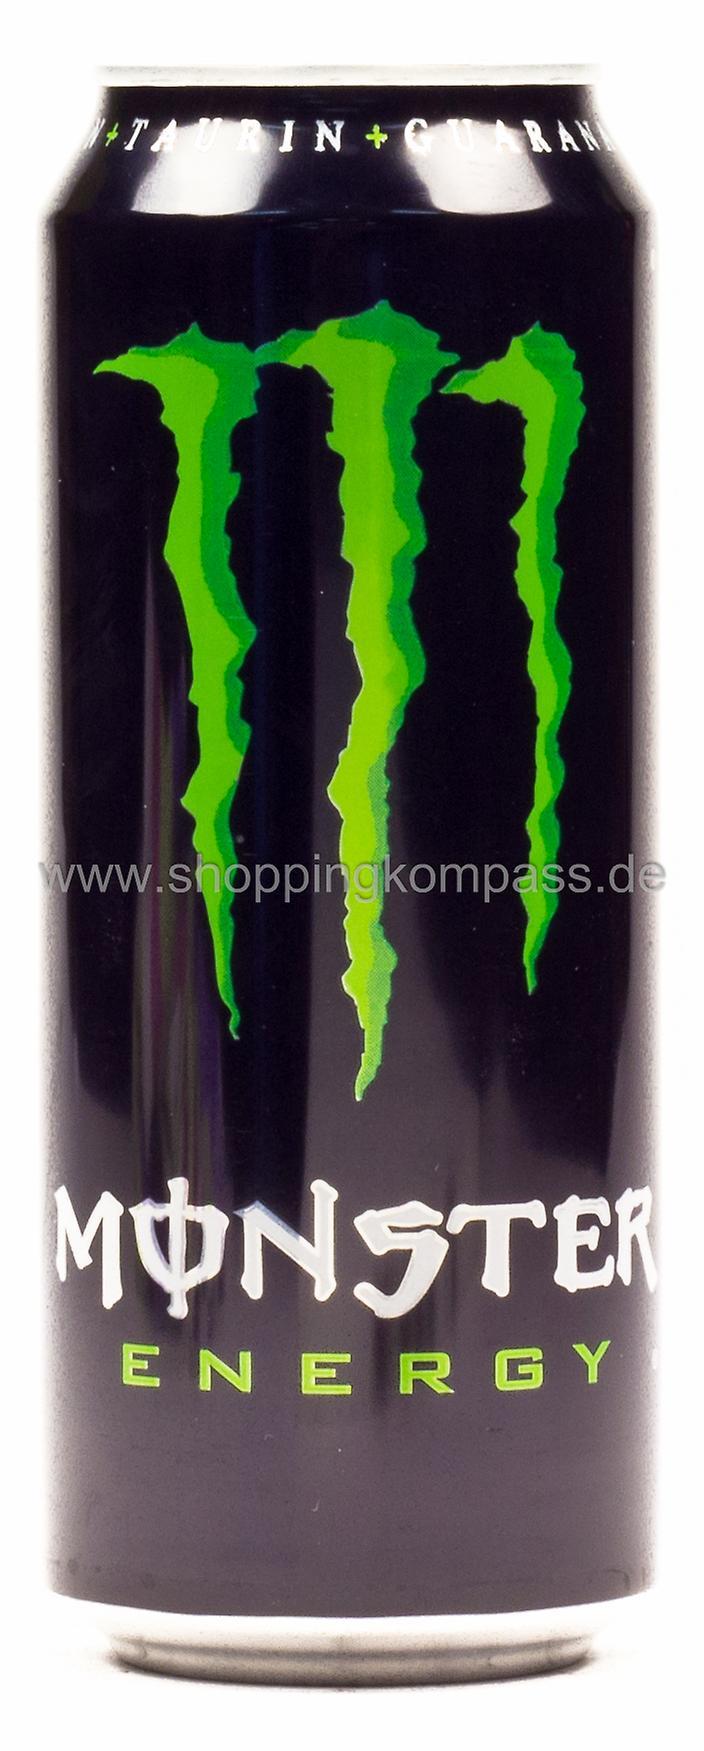 Energy-Drinks - Monster Energy Drink 0,5 l Dose EW 2 - Ihr ...